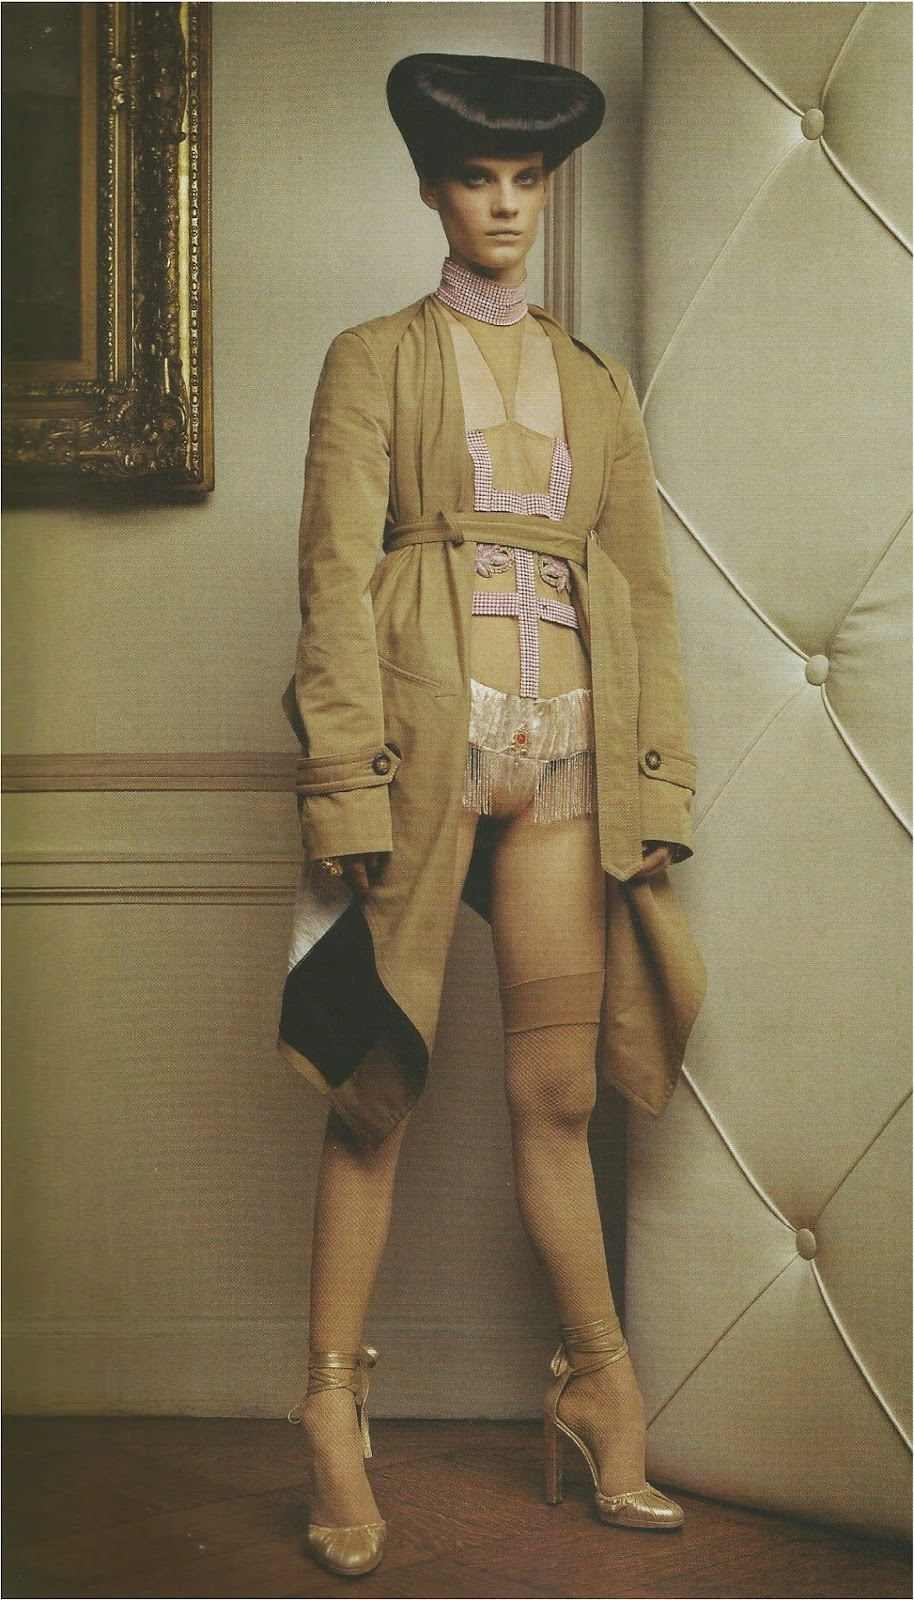 Devodotcom December 2014 Bettina Heels Netty Beige Vogue Italy 2004 Photography Paolo Roversi Bardo Fabiani Alex Cayley